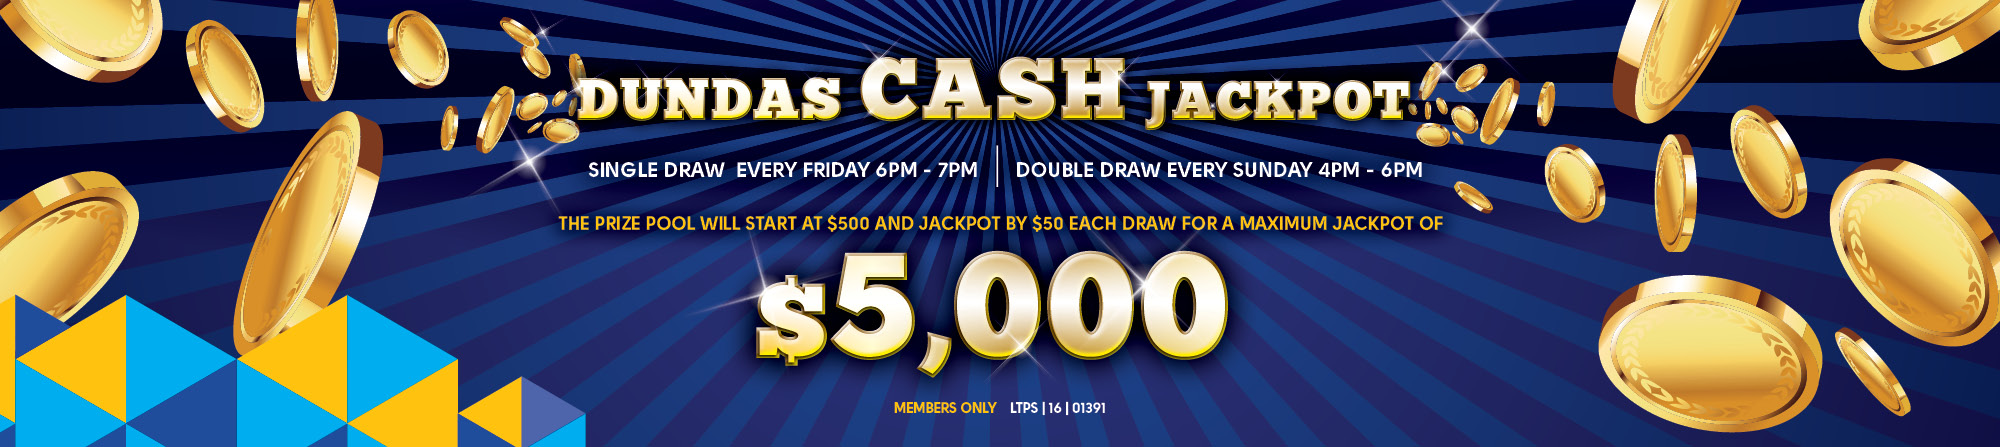 Dundas-Home-Page-Slider-Cash-Jackpot